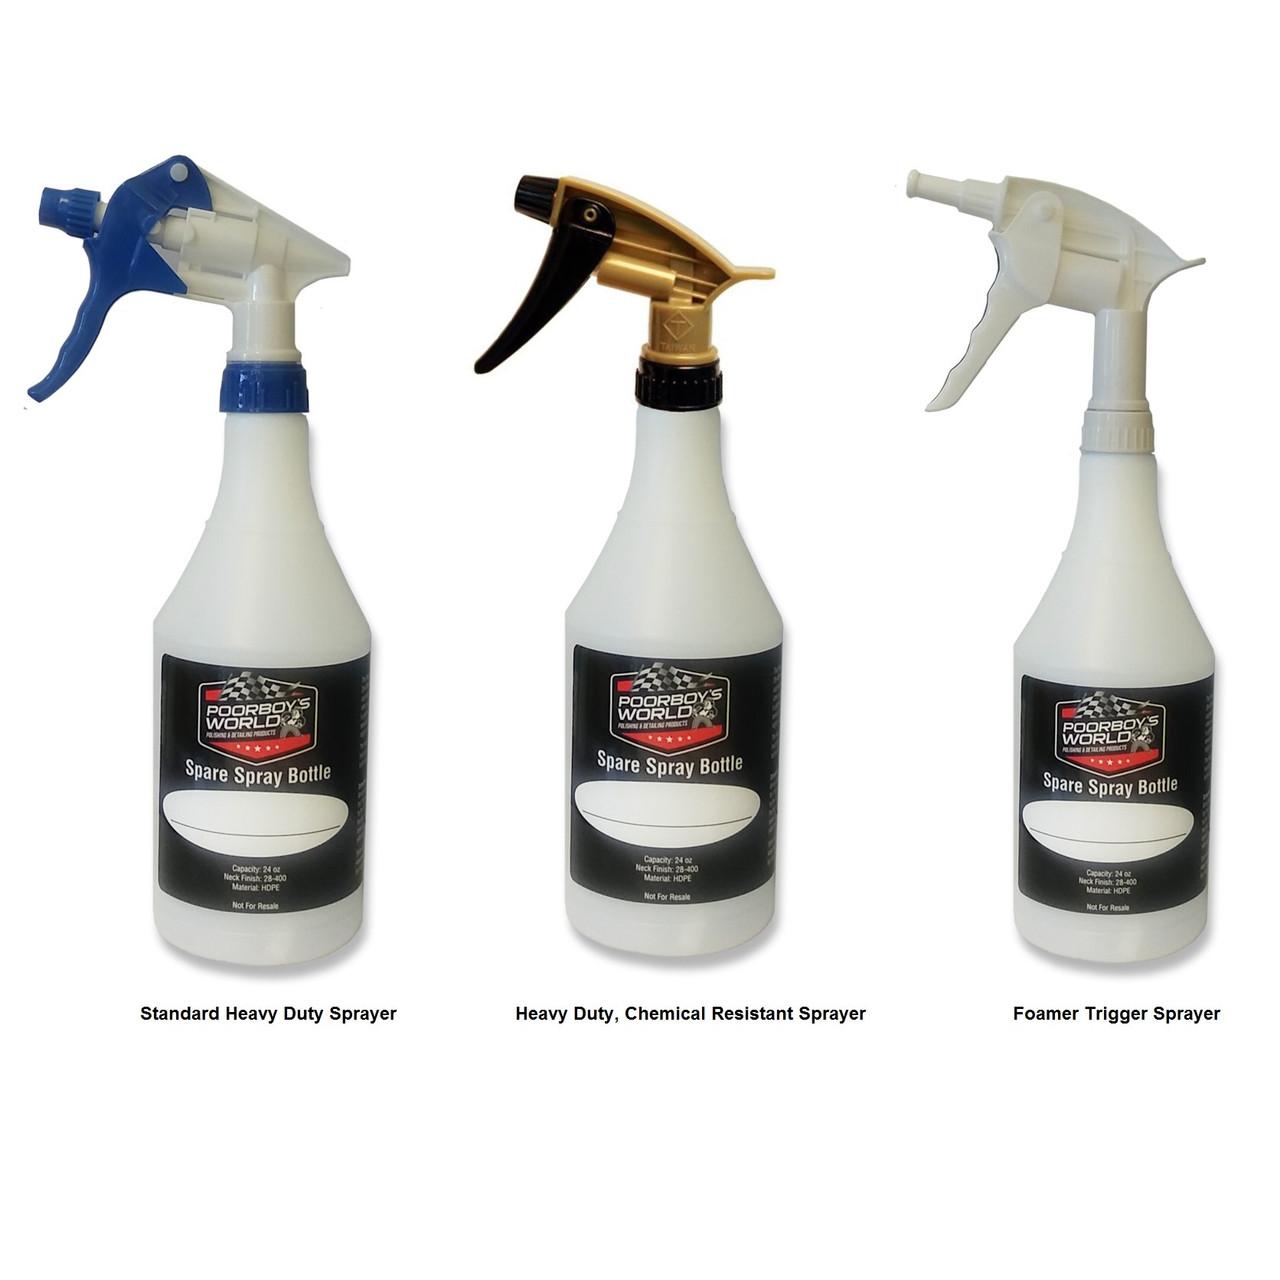 24oz HDPE Spray Bottle